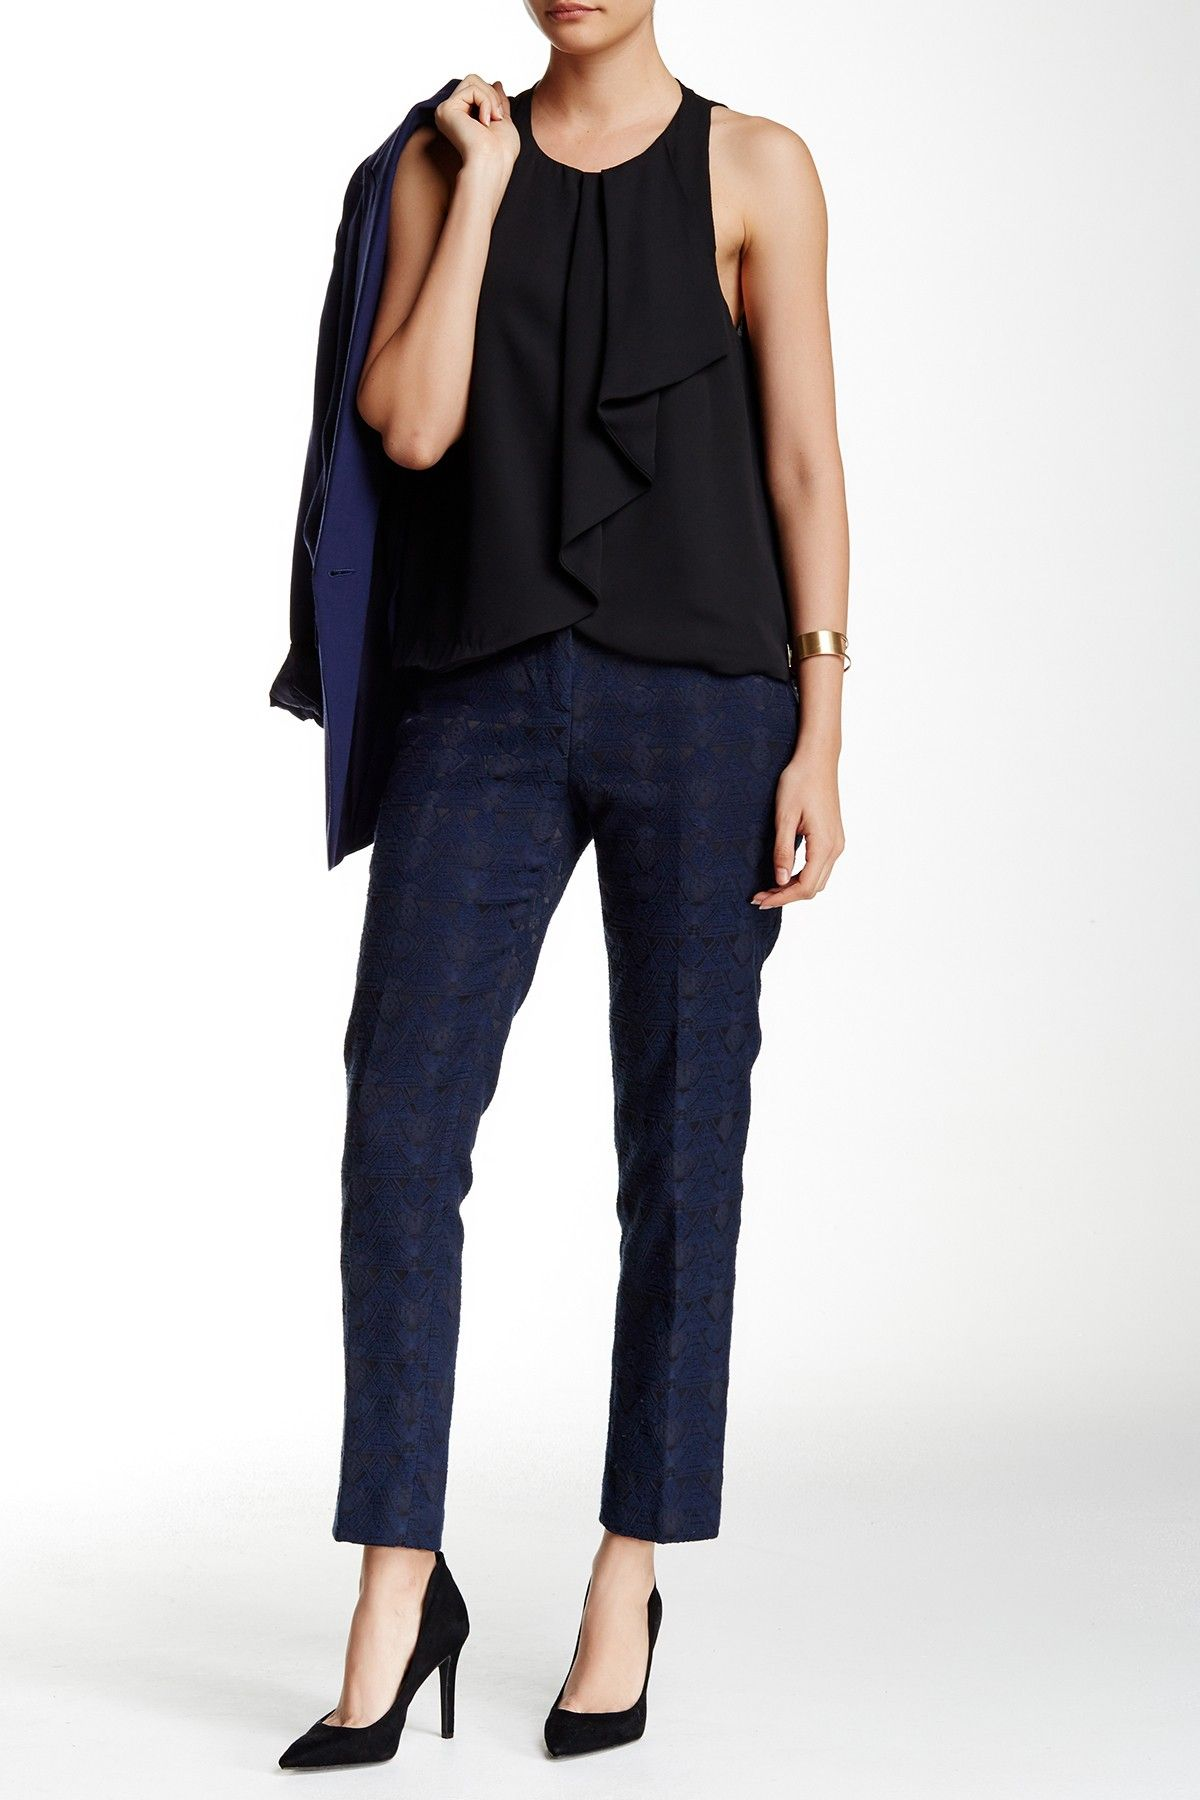 Amanda & Chelsea Jacquard W2W Pant Pants, Fashion